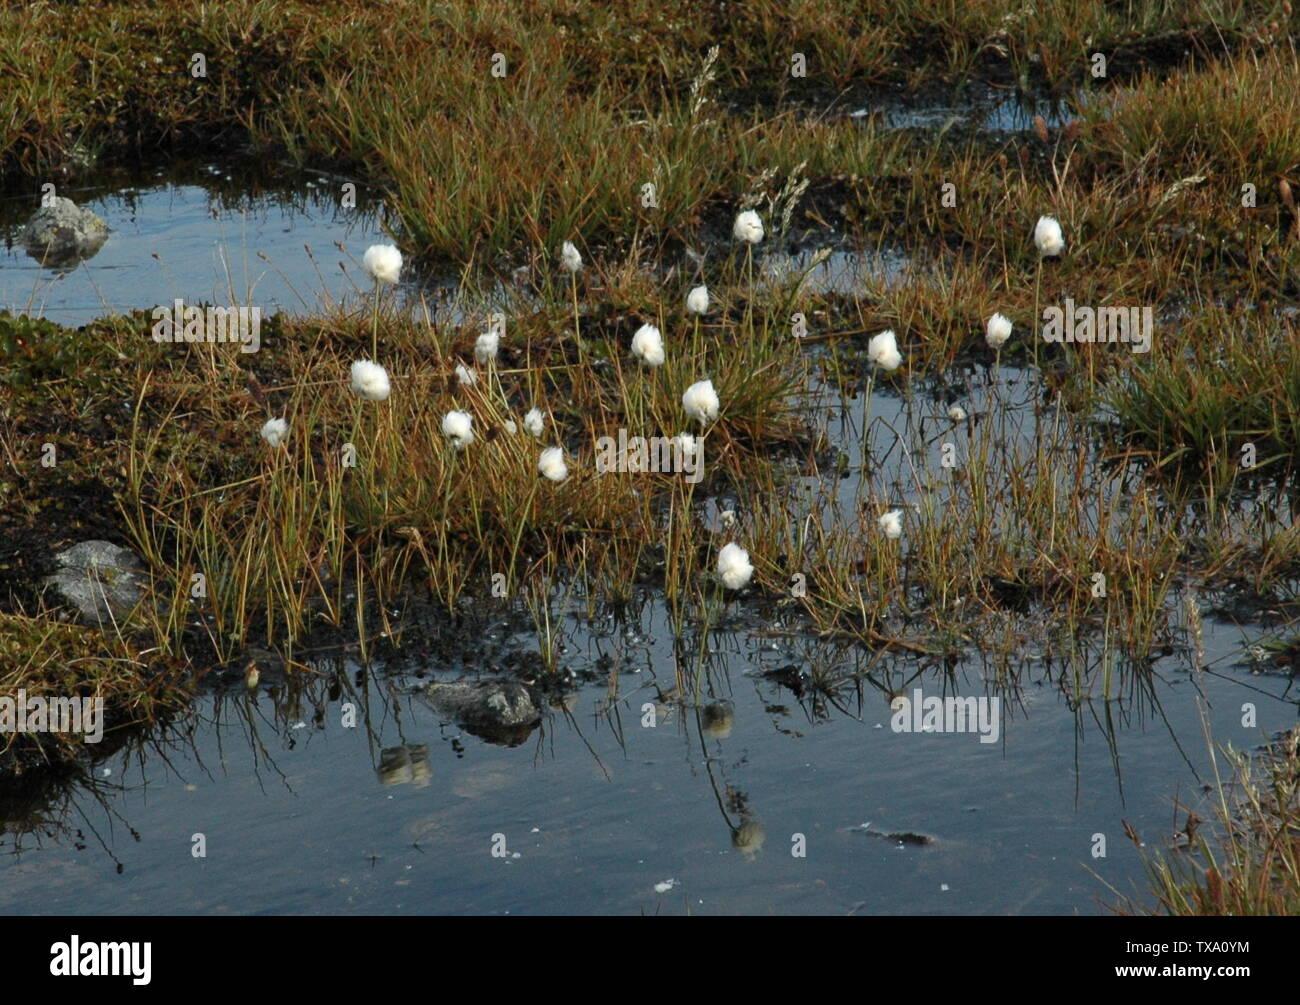 'Snøull (Eriophorum scheuchzeri Hoppe), halvgrasfamilien (Cyperaceae), These plants were found at Valdresflya, Norway at aprox. 1400 metres above sea level, september 2005.; 2005; Own work; Kjetil Lenes; ' - Stock Image